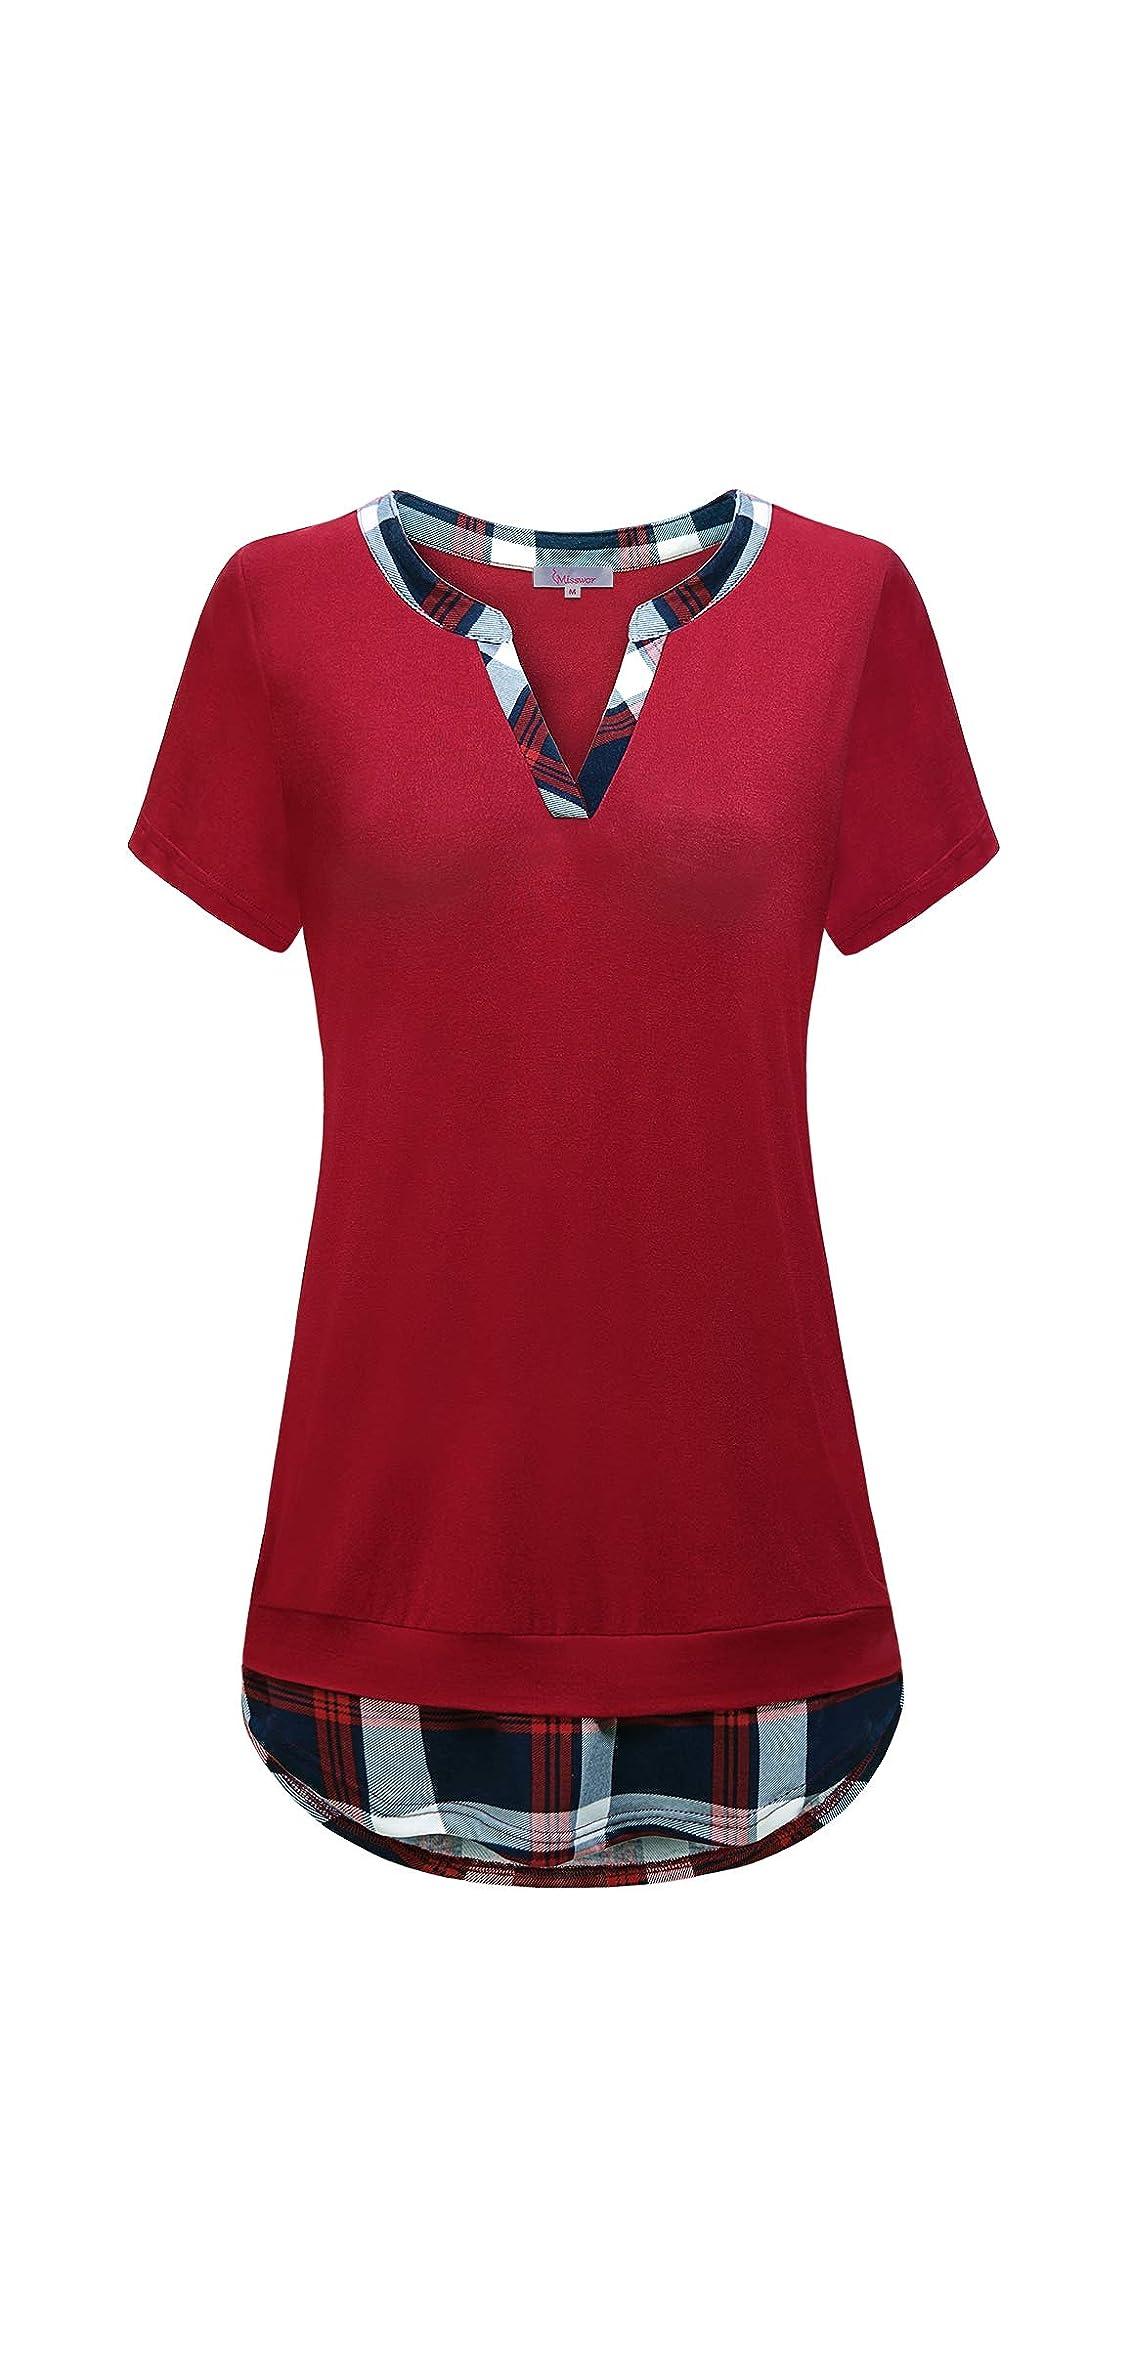 Women V Neck Tunics Shirt Short Sleeve Patchwork Blouse